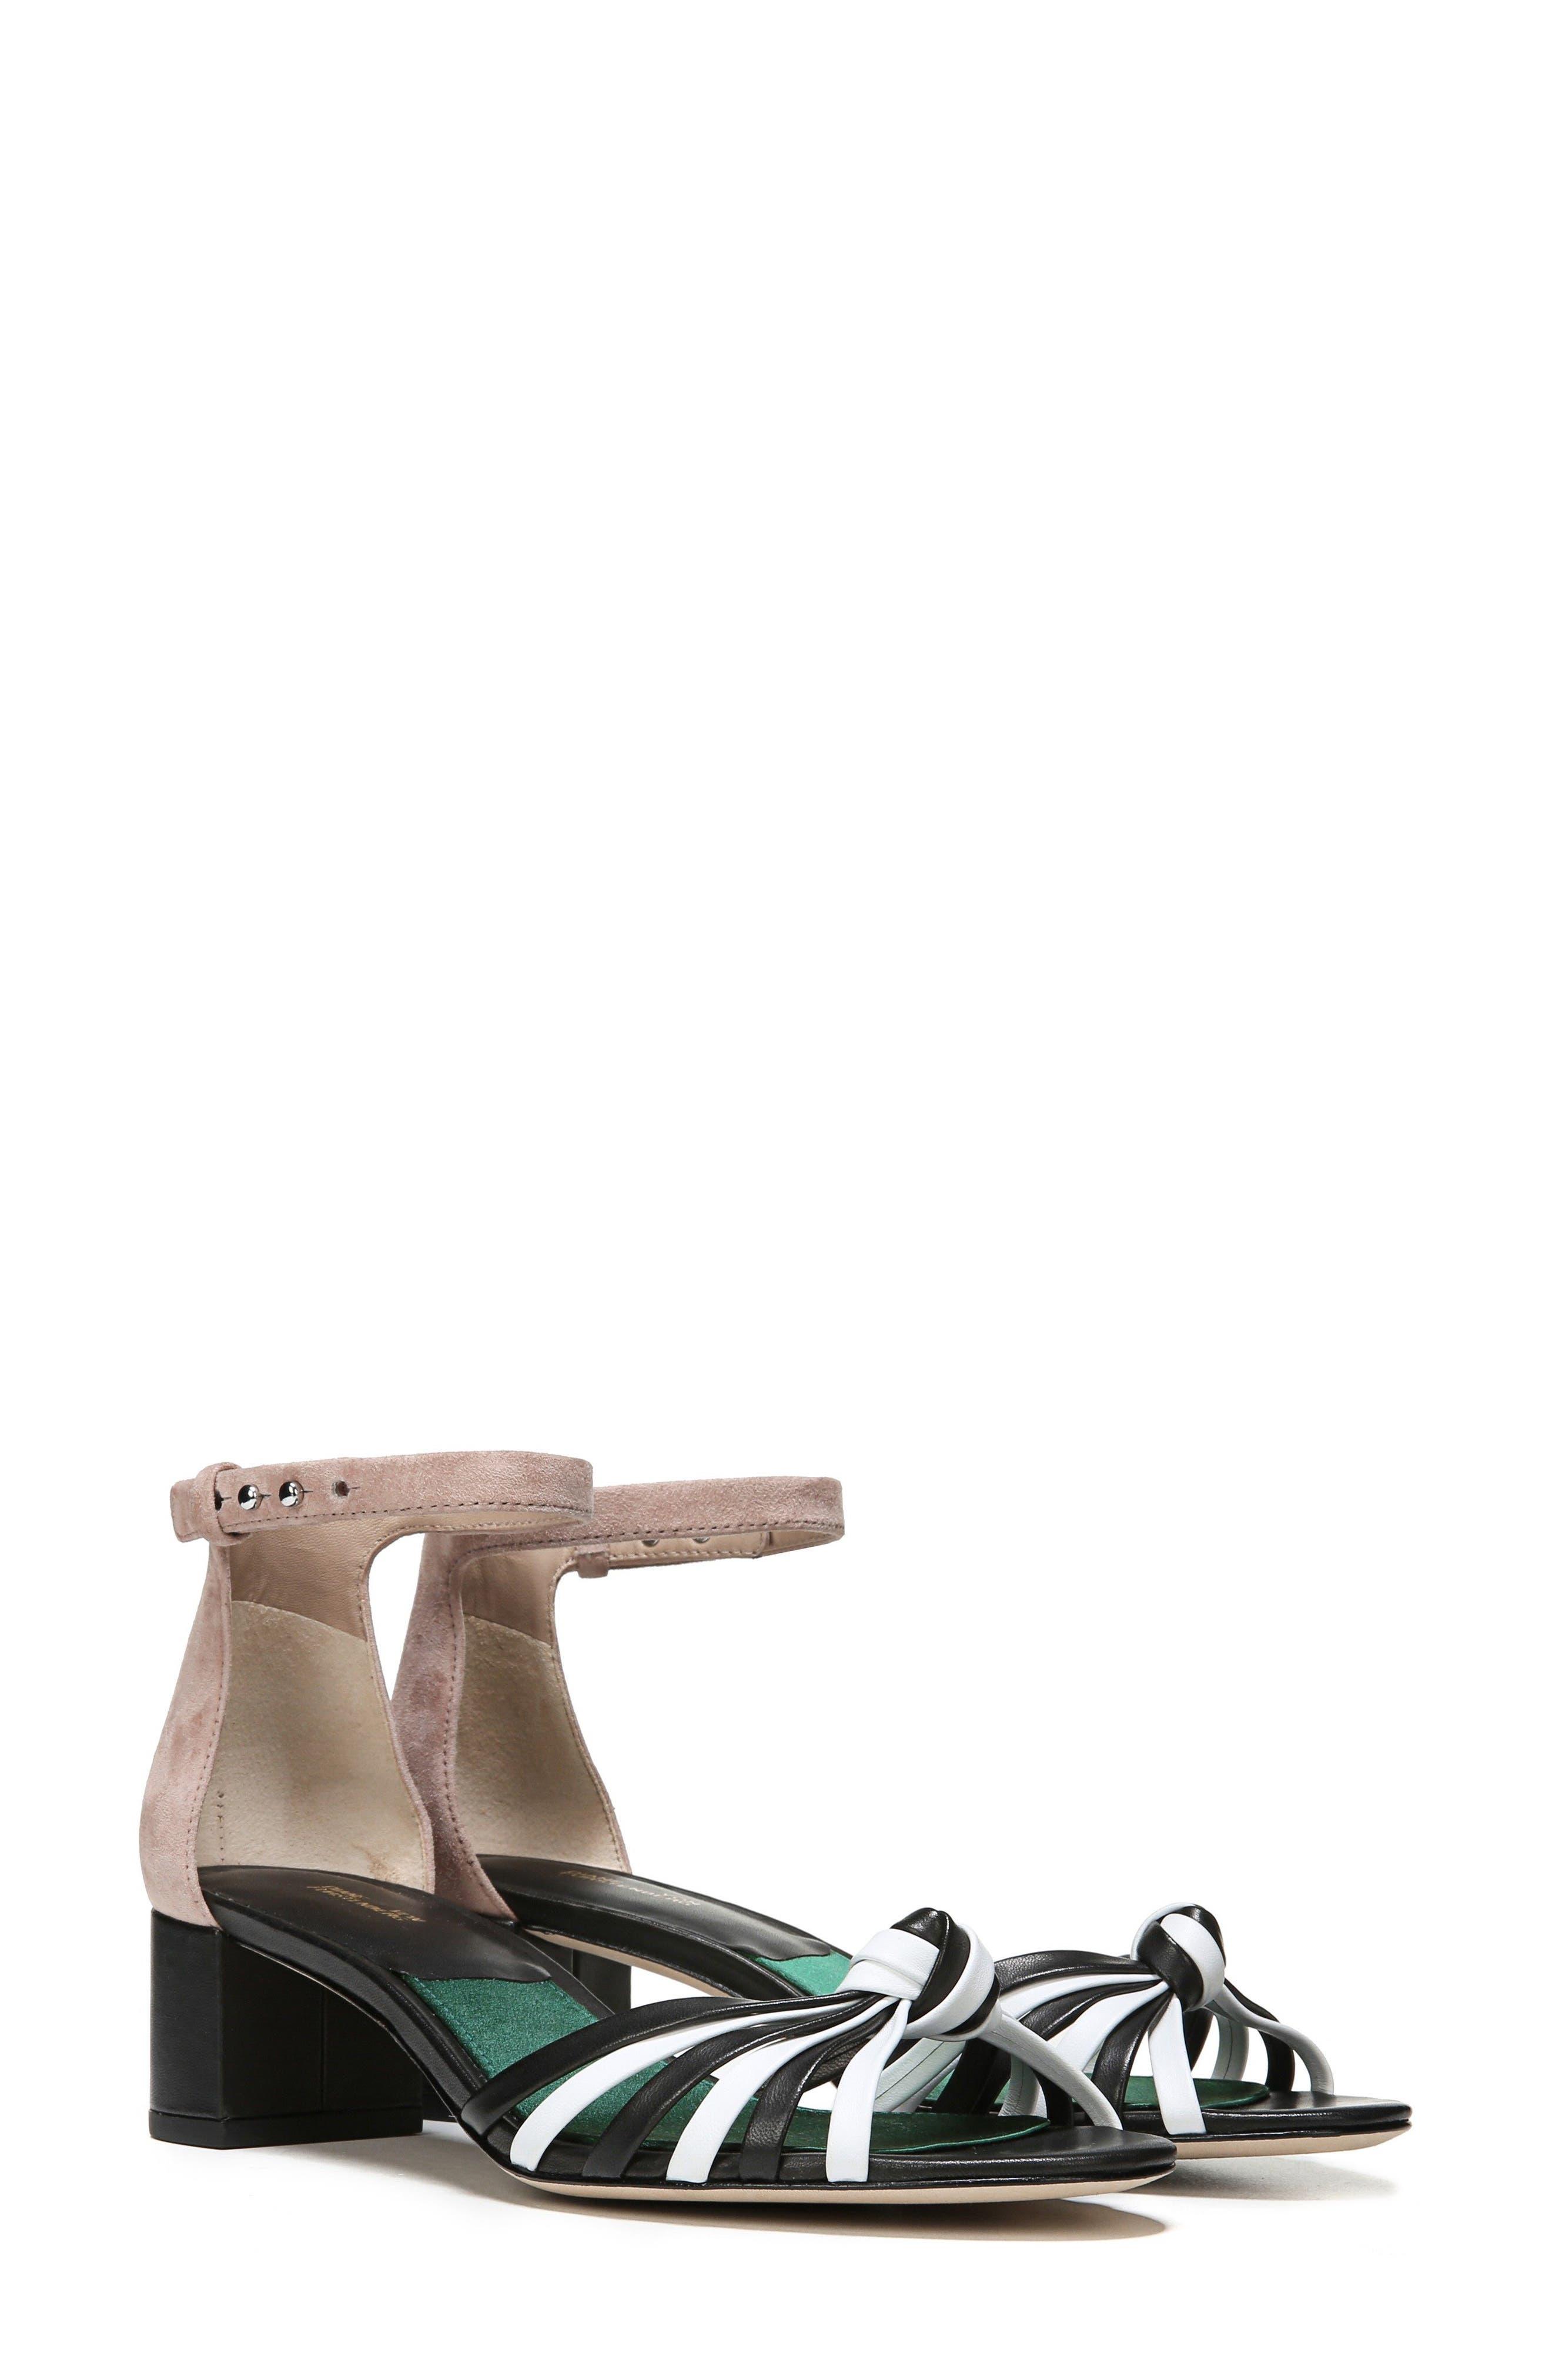 Fonseca Ankle Strap Sandal,                             Alternate thumbnail 7, color,                             001